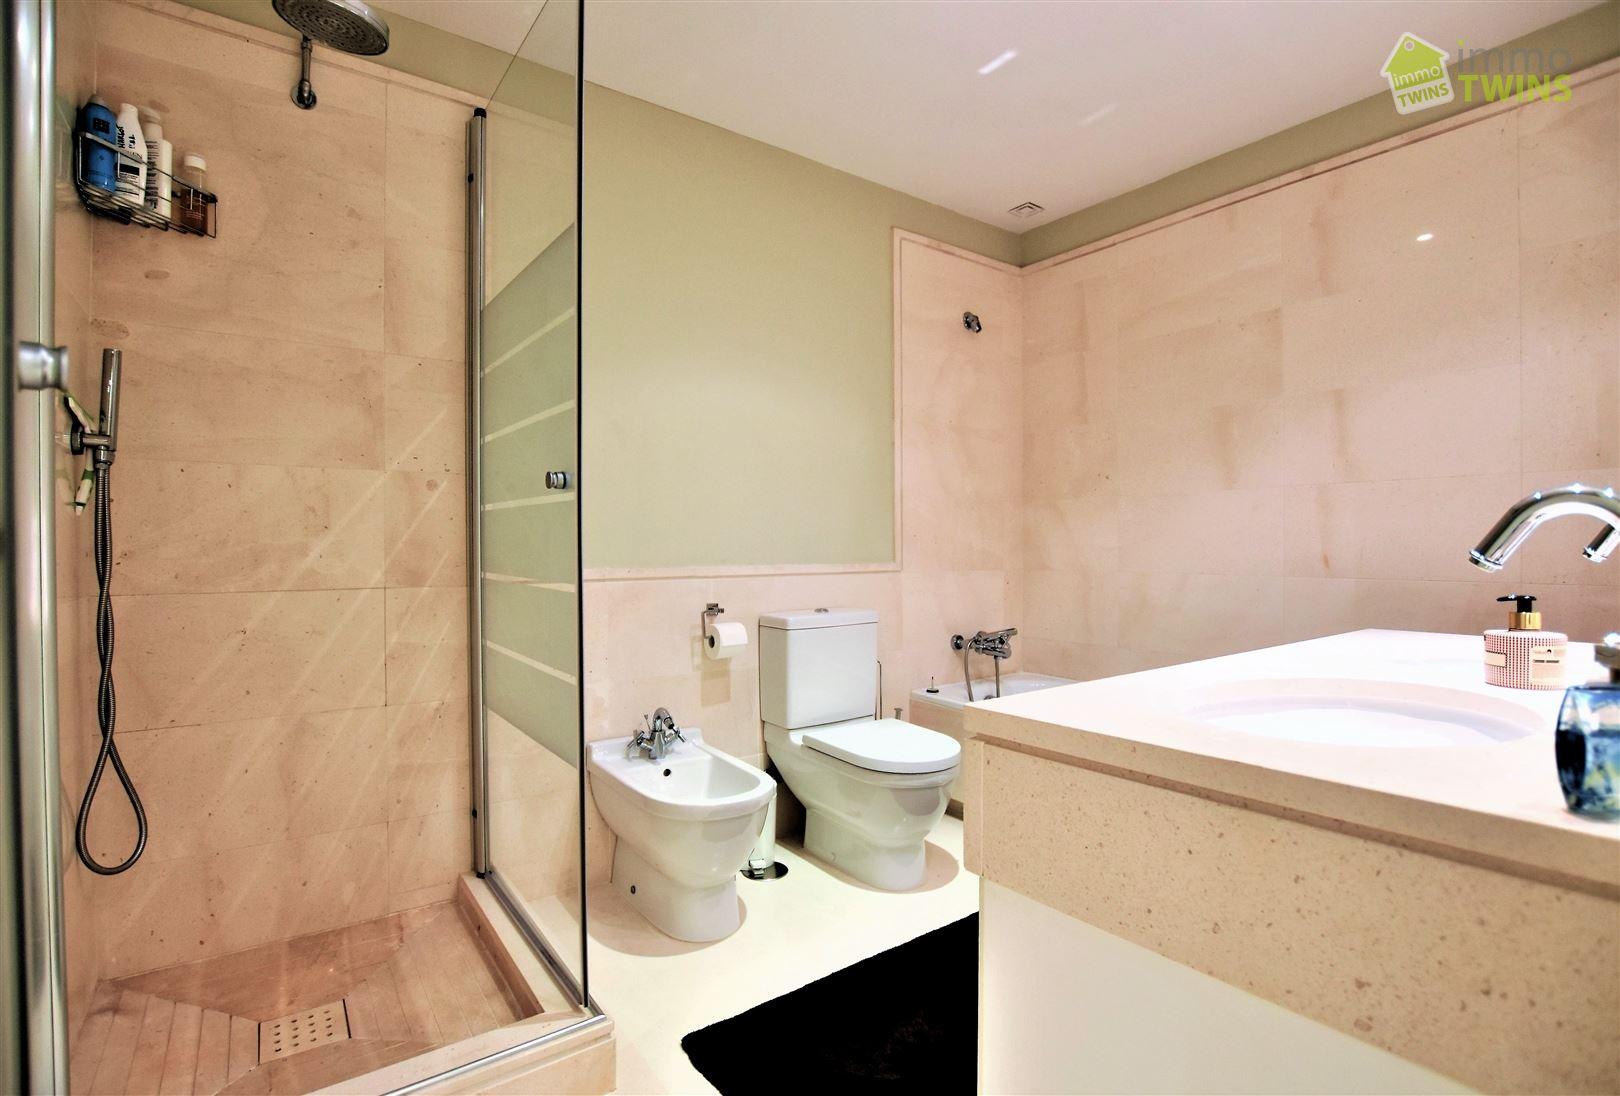 Foto 21 : Appartement te 29679 MARBELLA (Spanje) - Prijs € 485.000